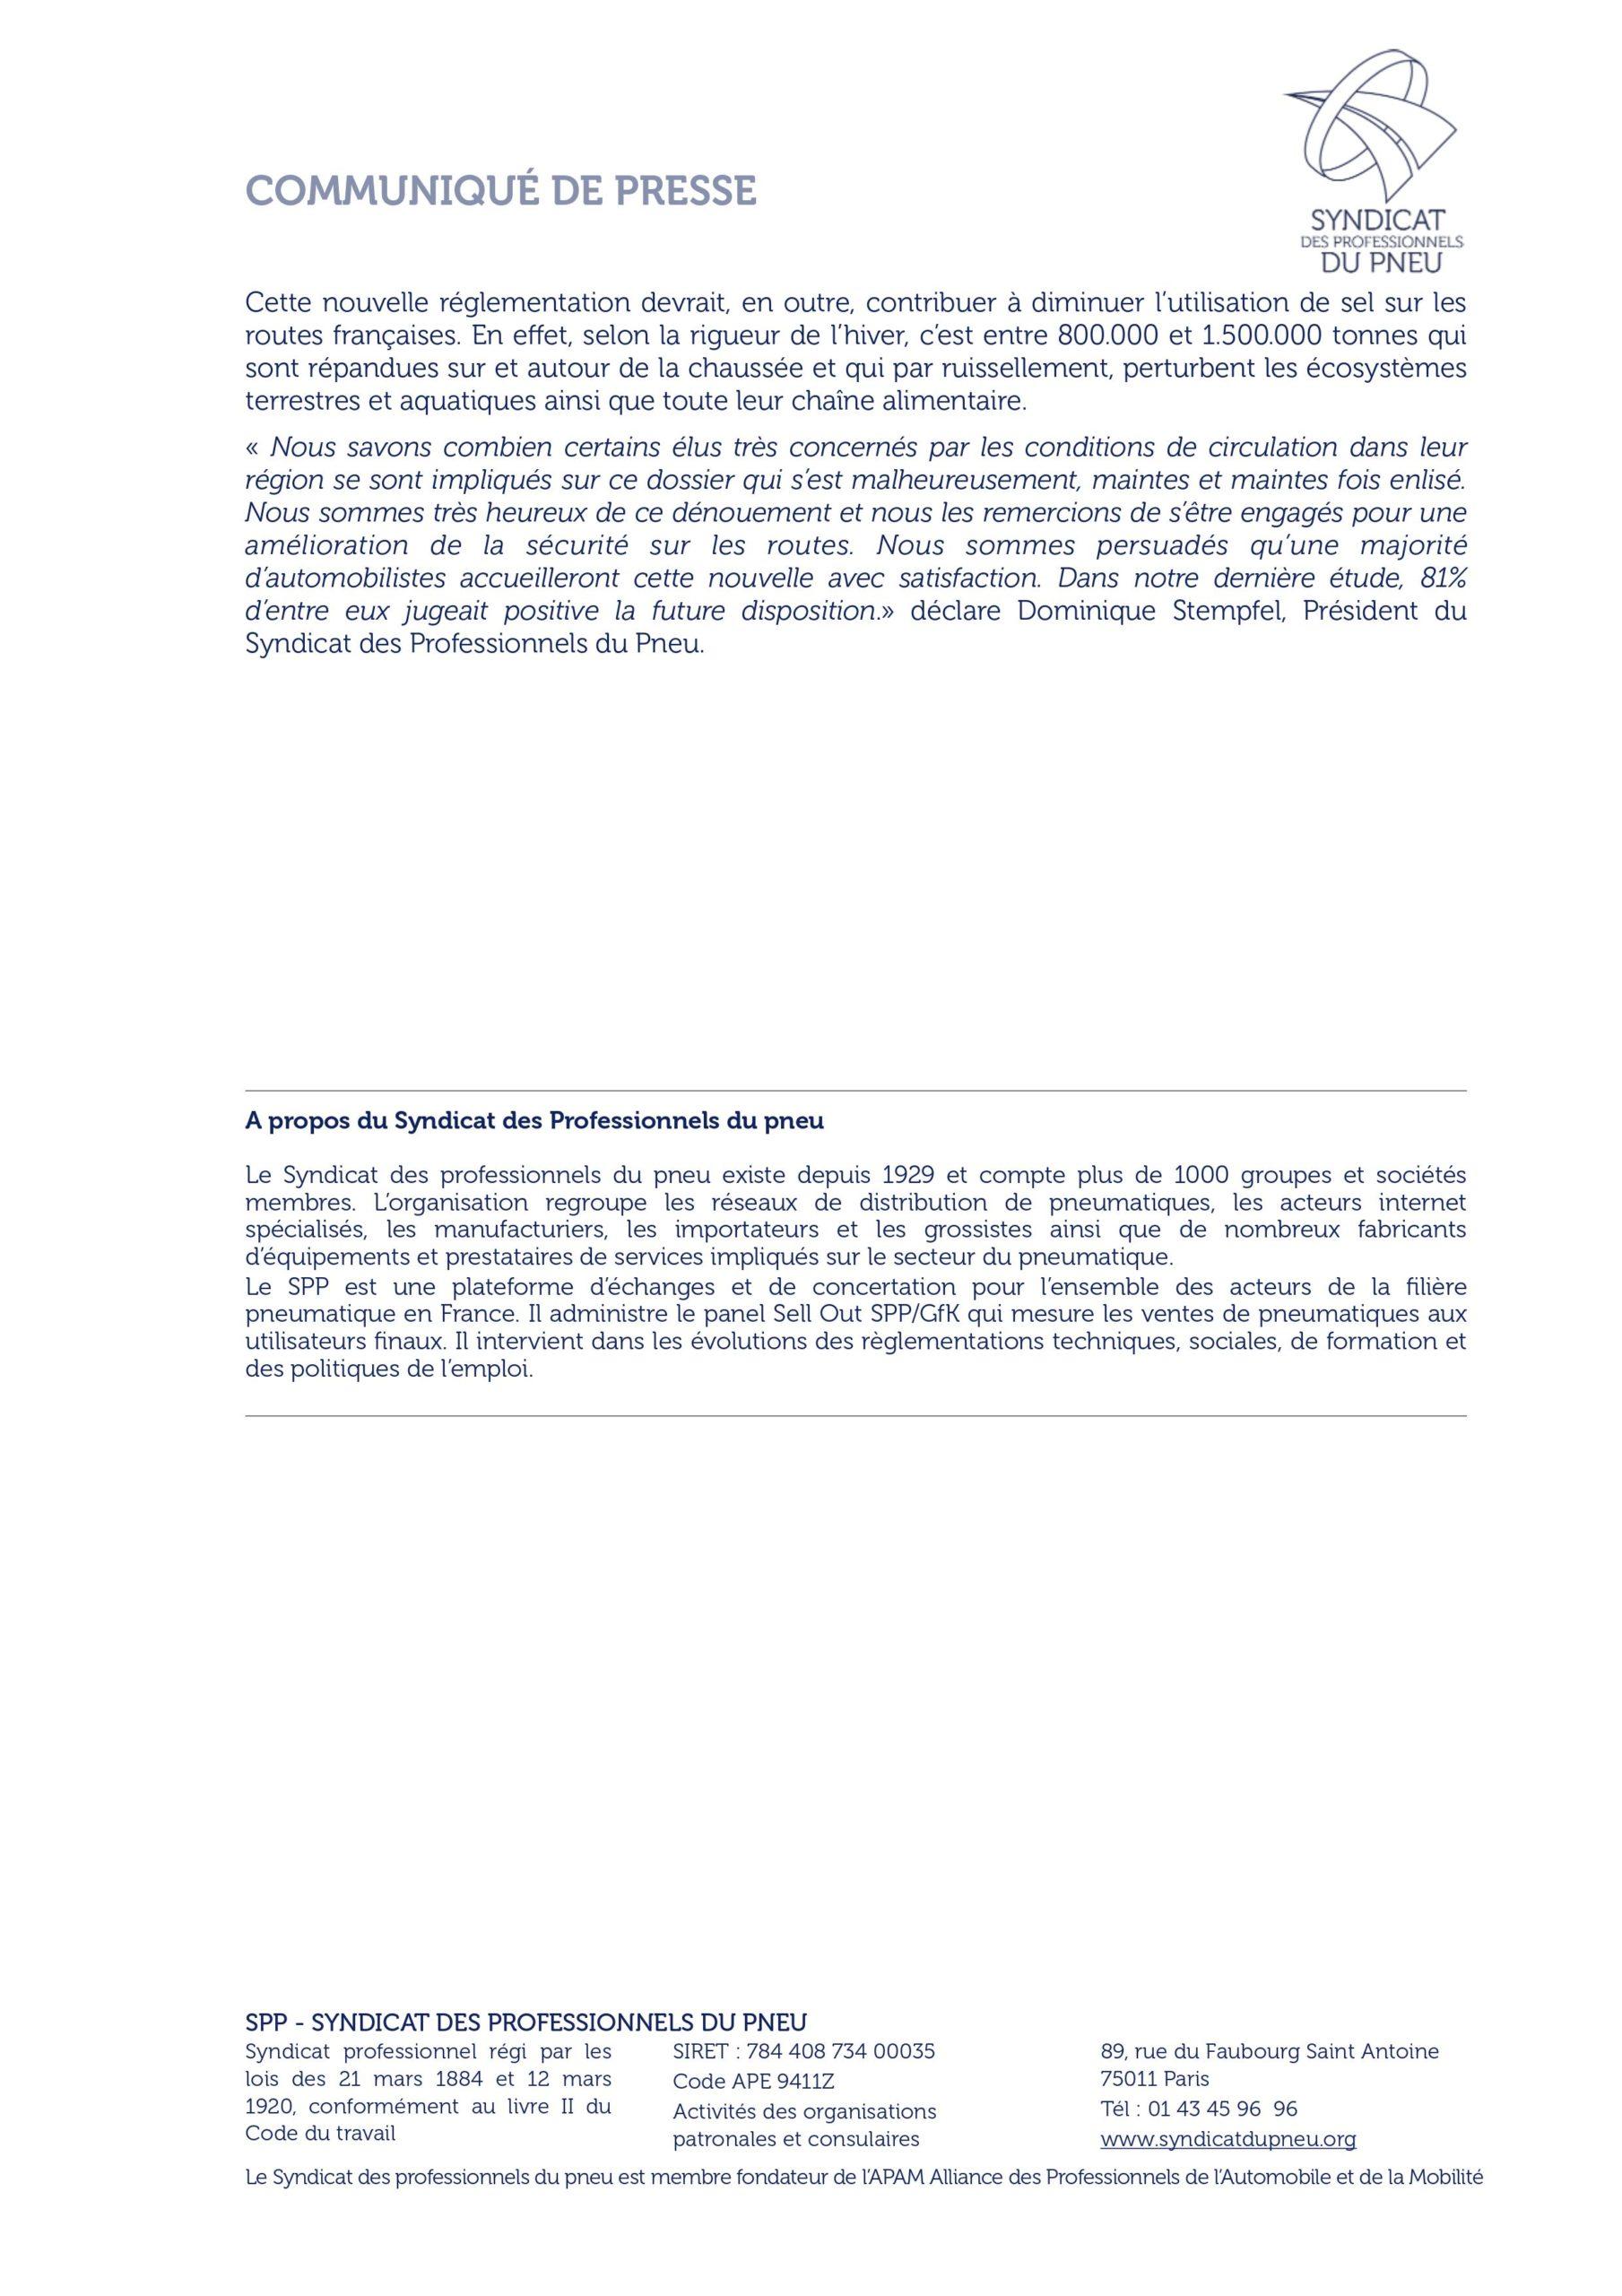 cp-decret-reglementation-pneu-hiver-spp-19-10-2020-1 Garage Muller Burnhaupt Le Bas 68